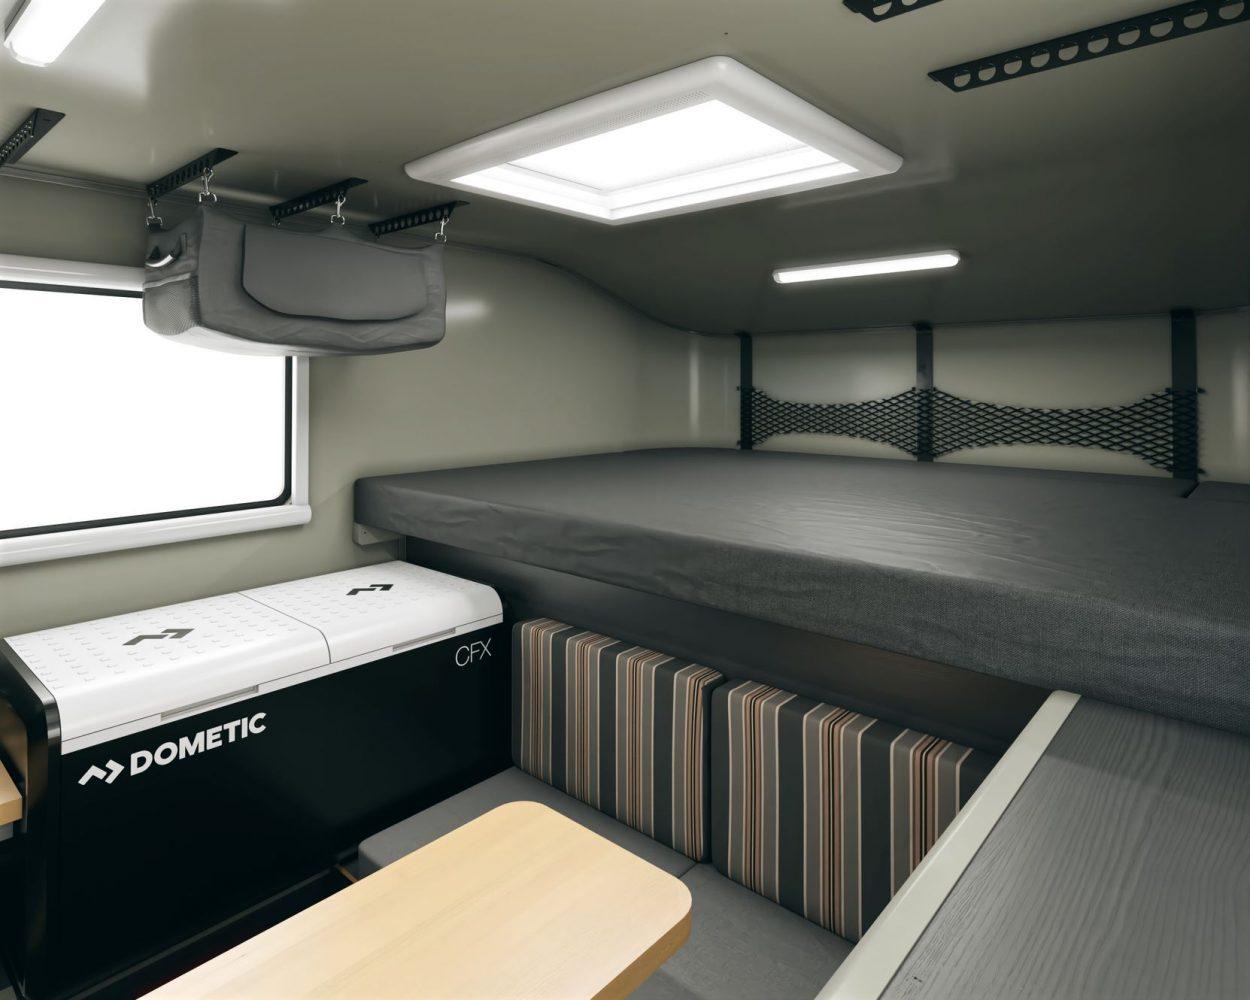 Scout campers kenai truck camper interior layout 2